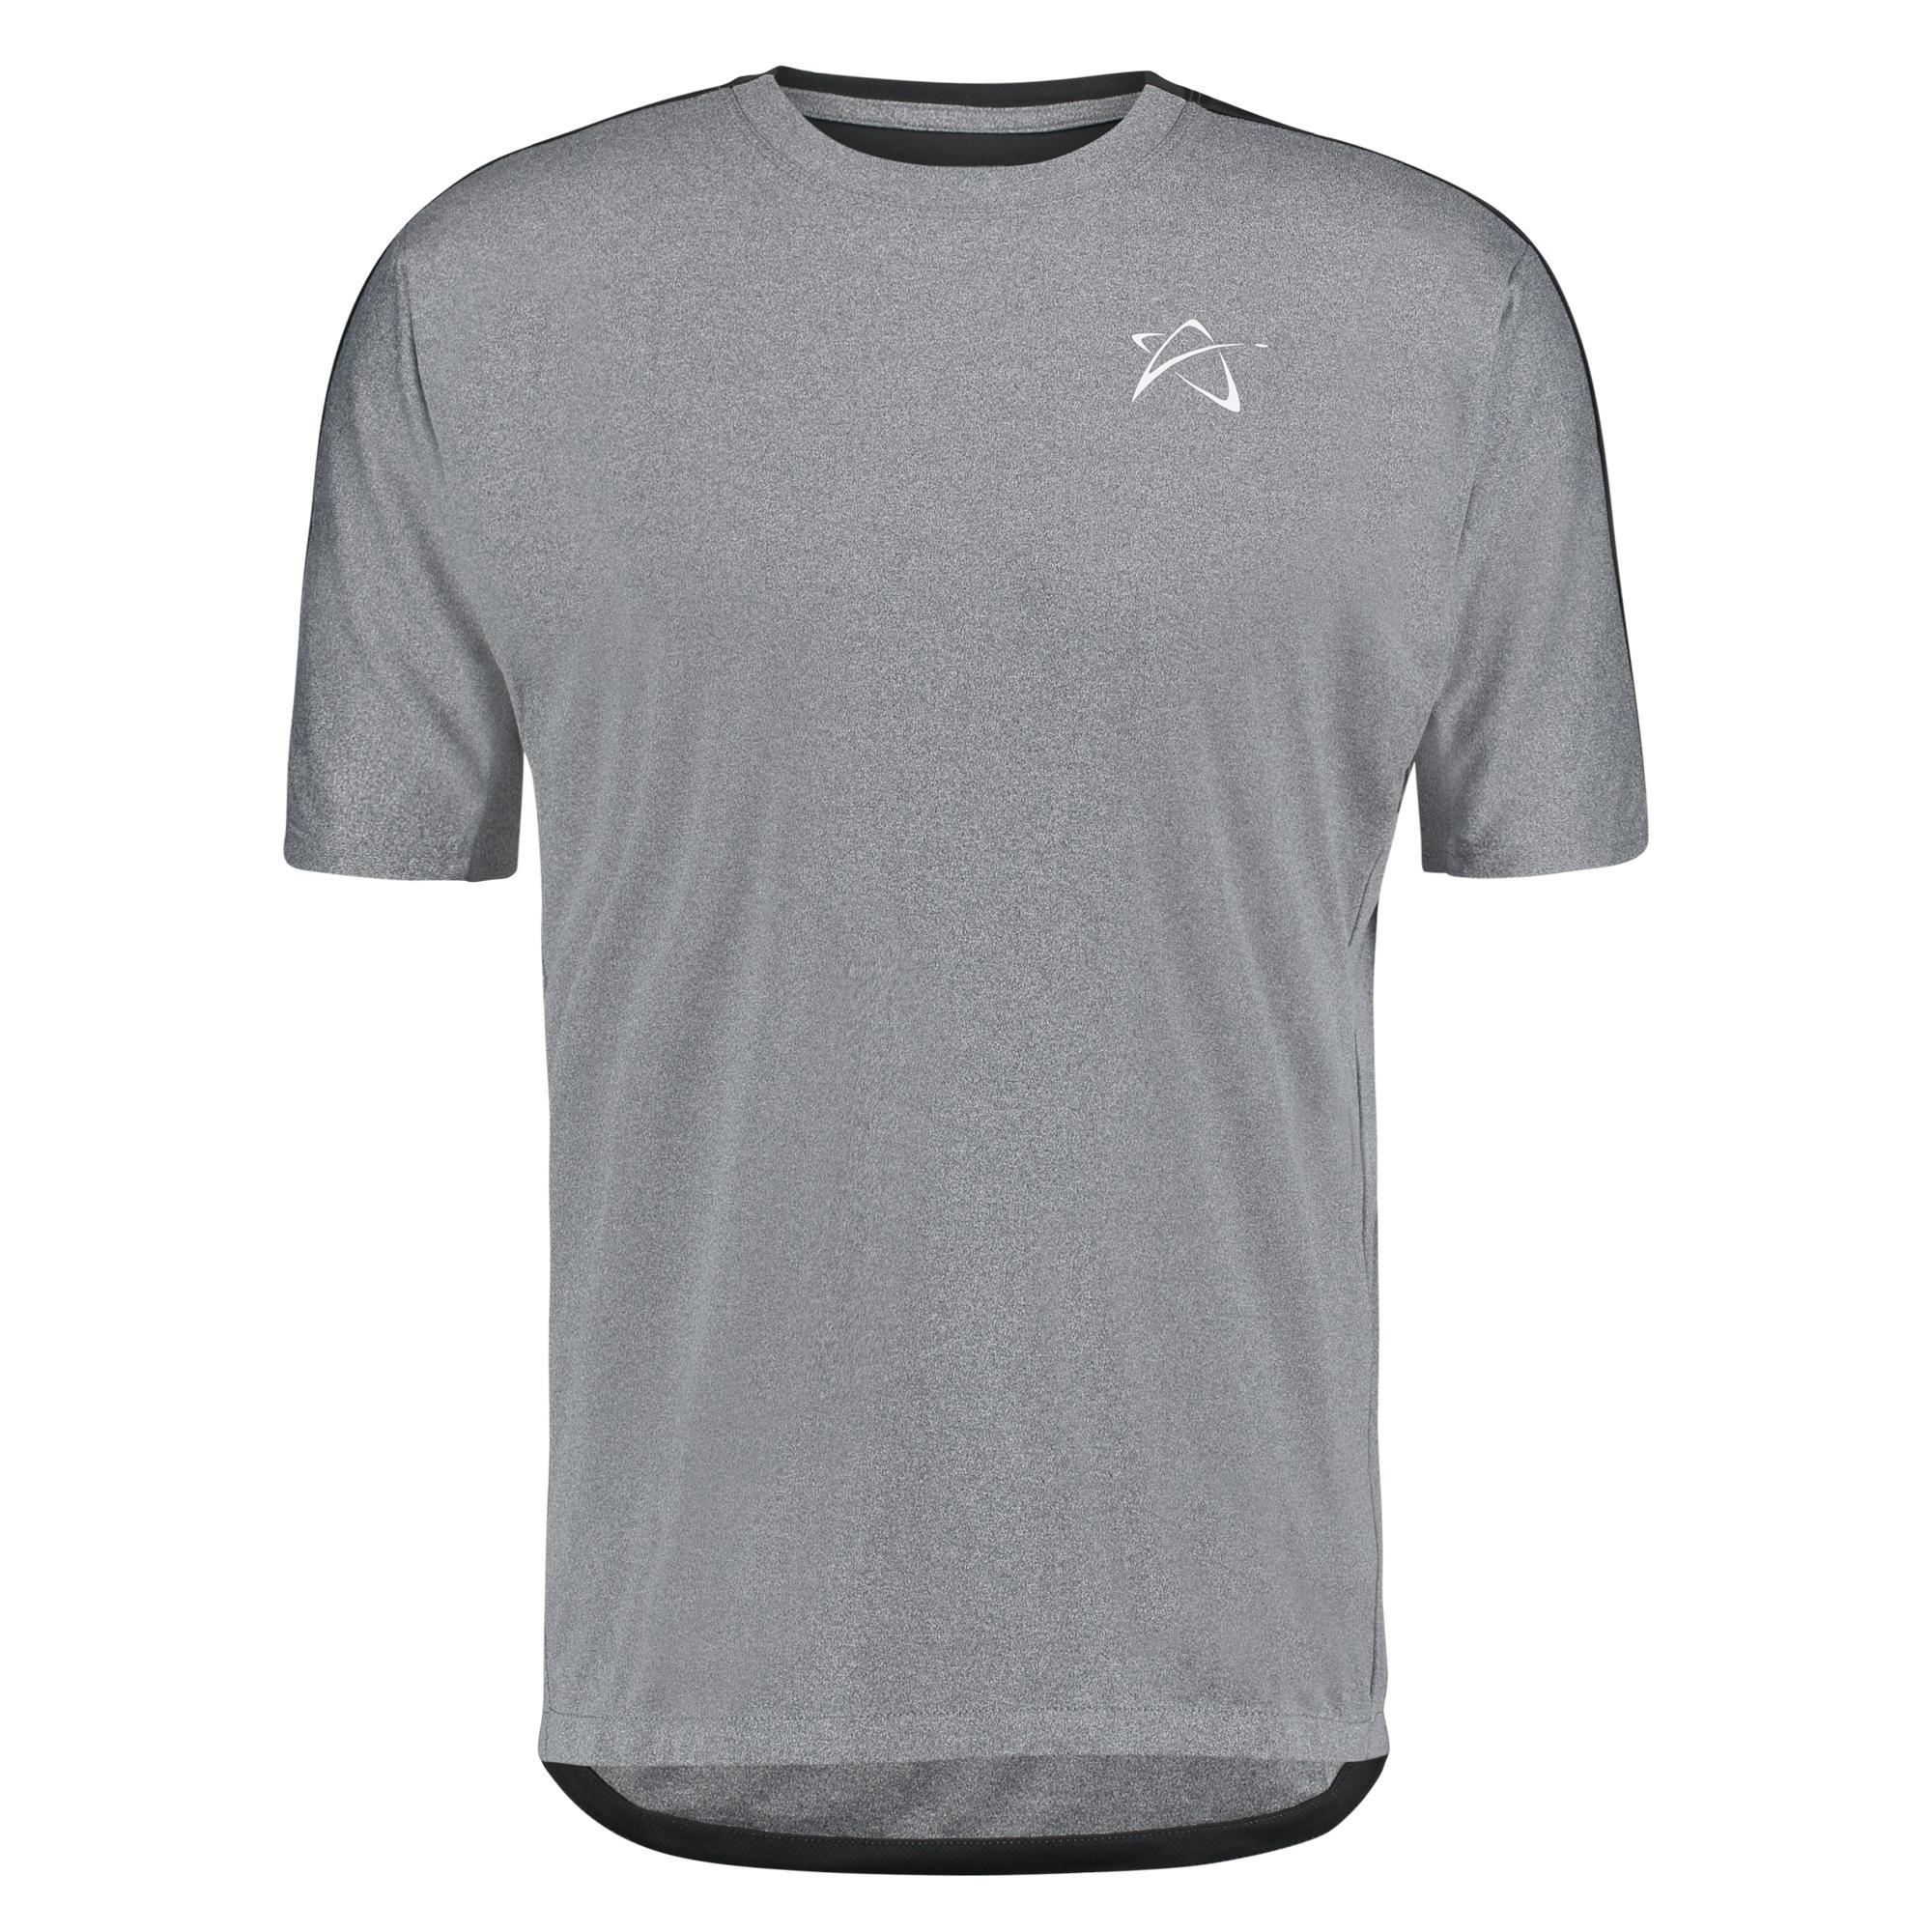 ace top grey front.jpg